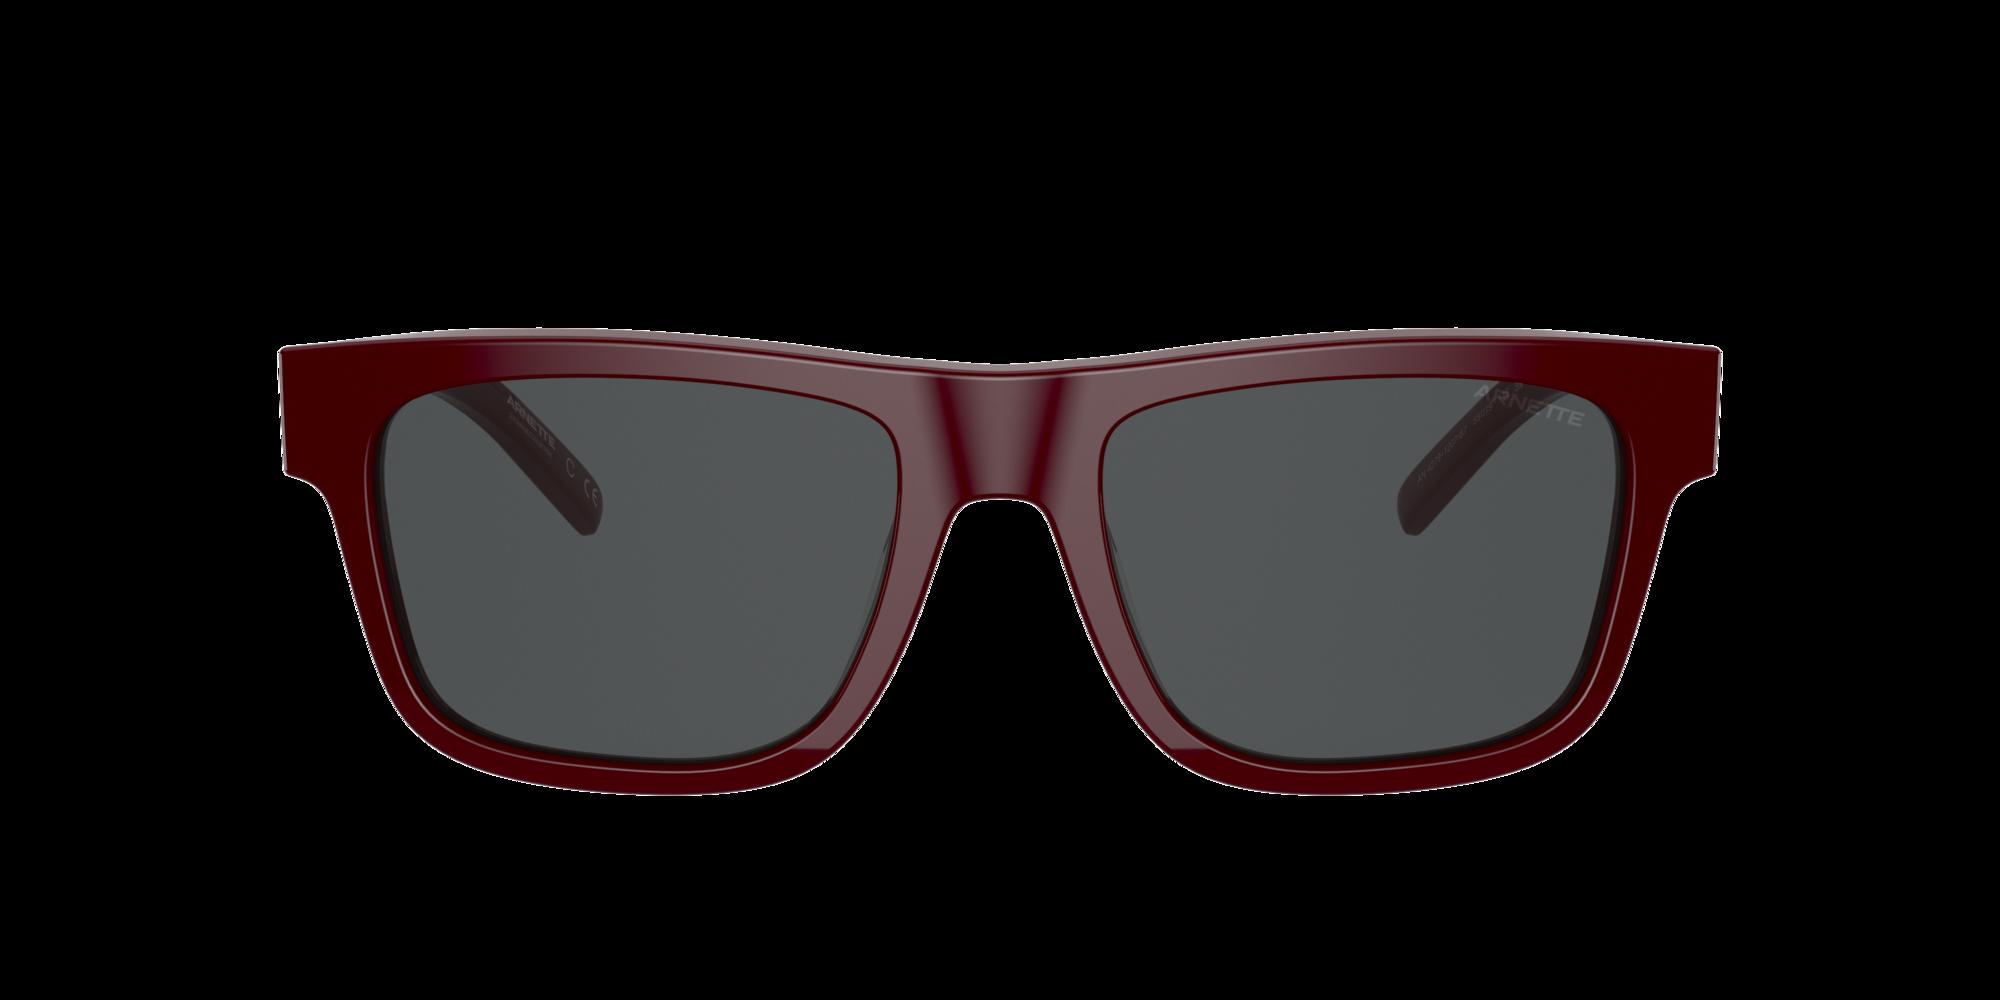 Image for POST MALONE+ARNETTE from LensCrafters | Glasses, Prescription Glasses Online, Eyewear